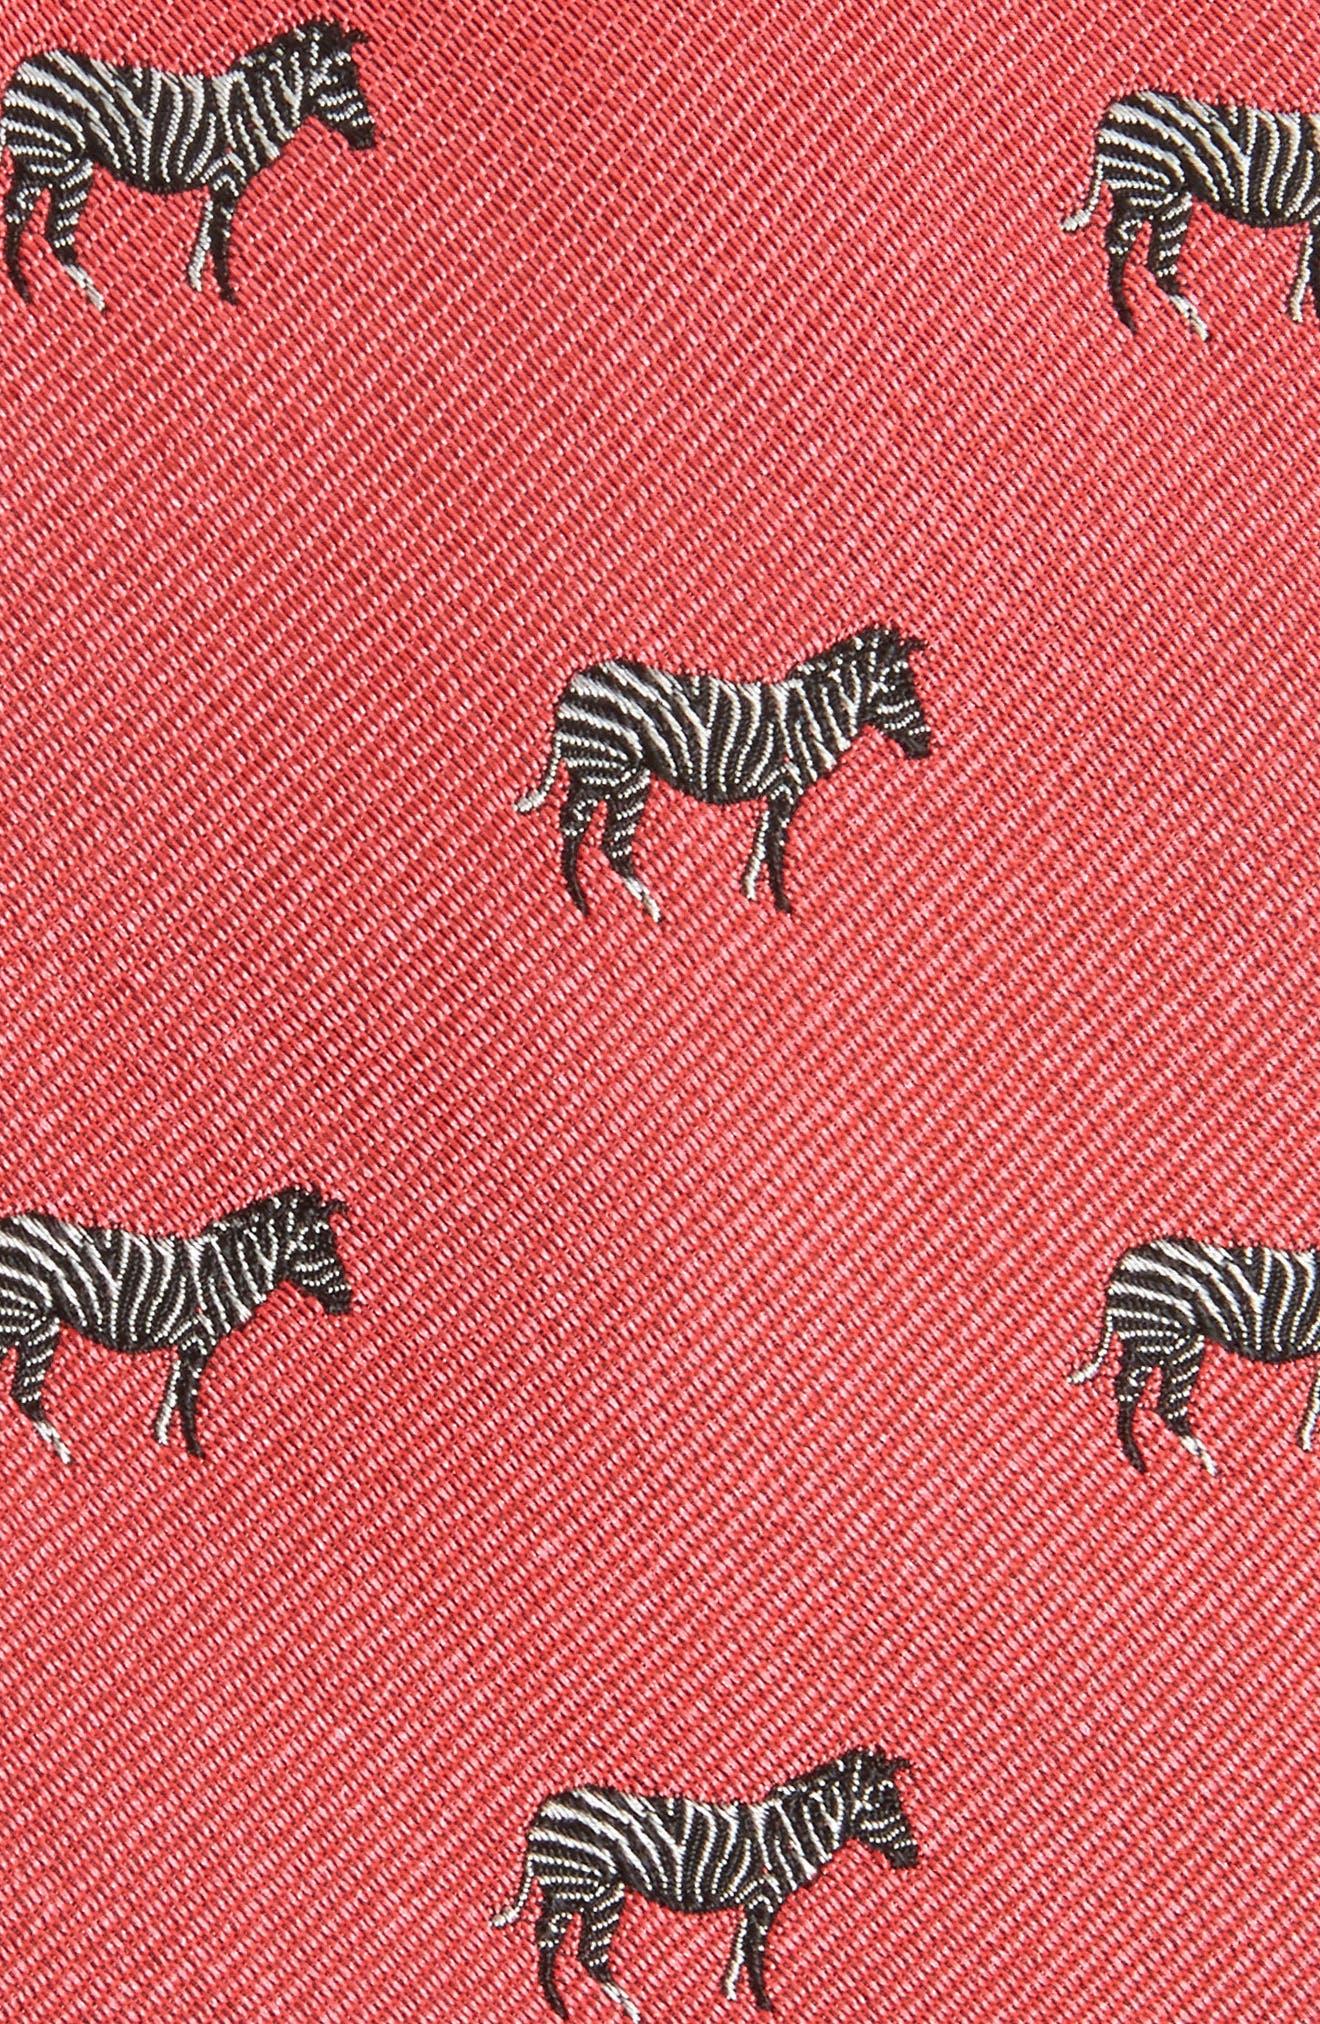 Zebra Dazzle Print Silk Tie,                             Alternate thumbnail 2, color,                             Lifeguard Red